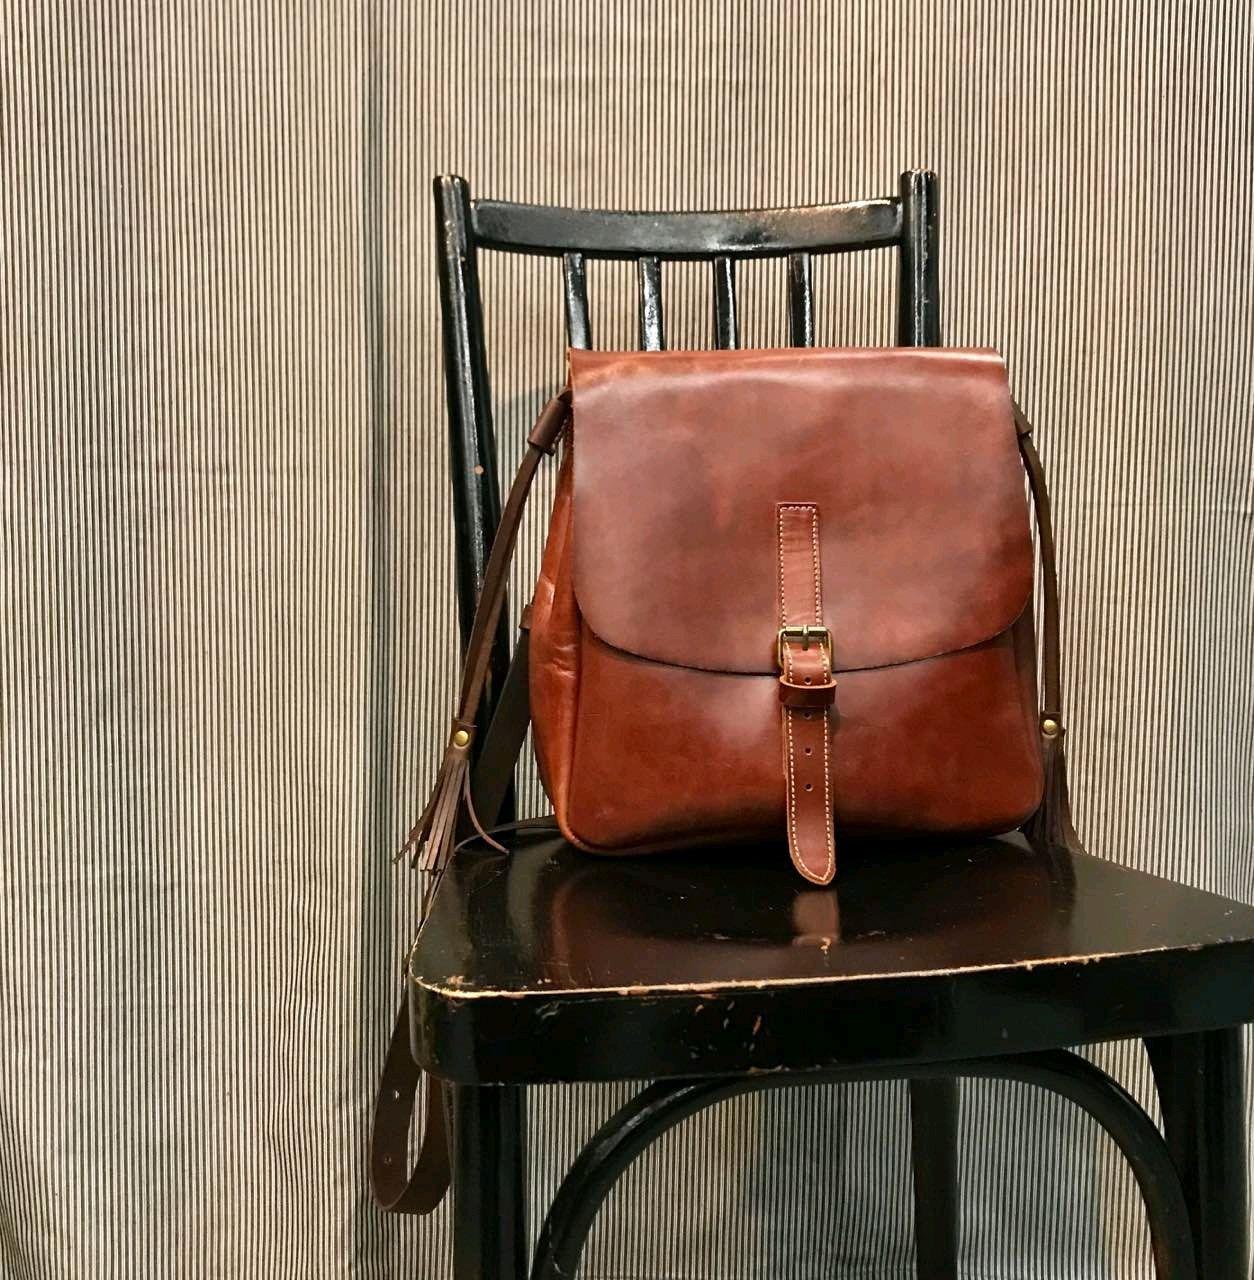 Кожаная сумка коньячного цвета, Сумки, Москва, Фото №1